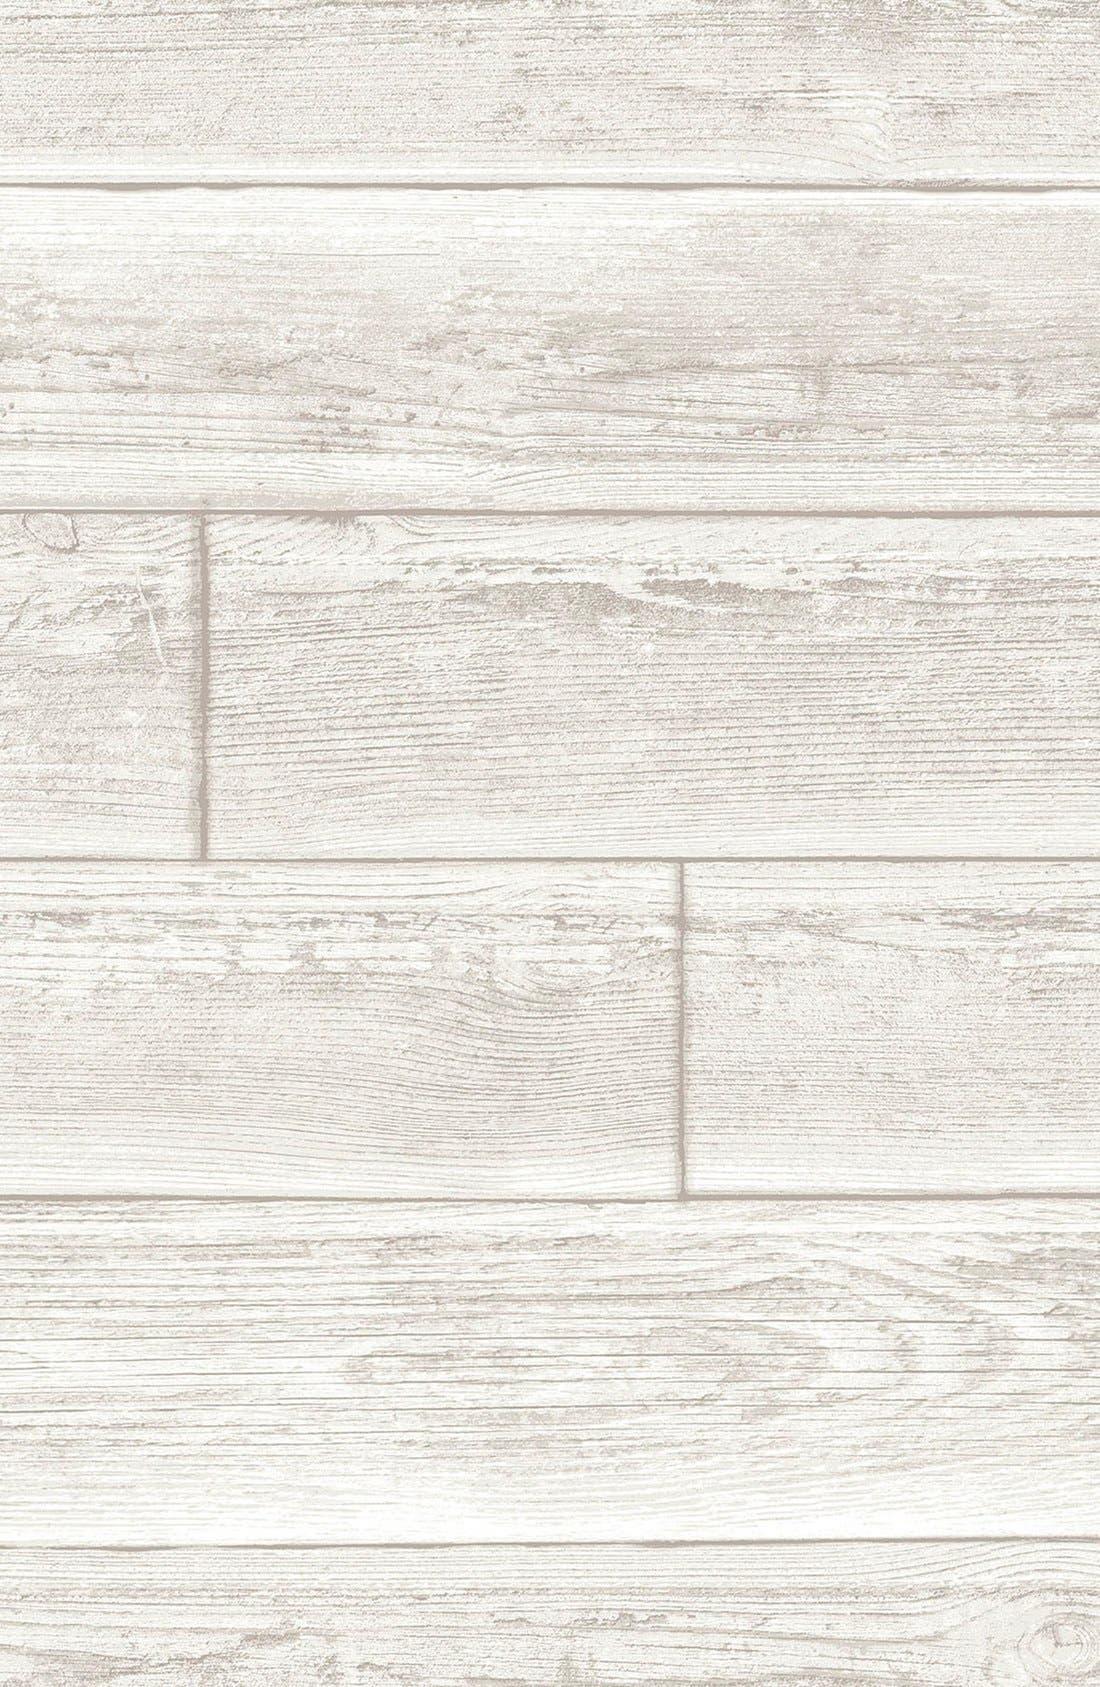 Alternate Image 1 Selected - Wallpops Serene Reusable Peel & Stick Vinyl Wallpaper